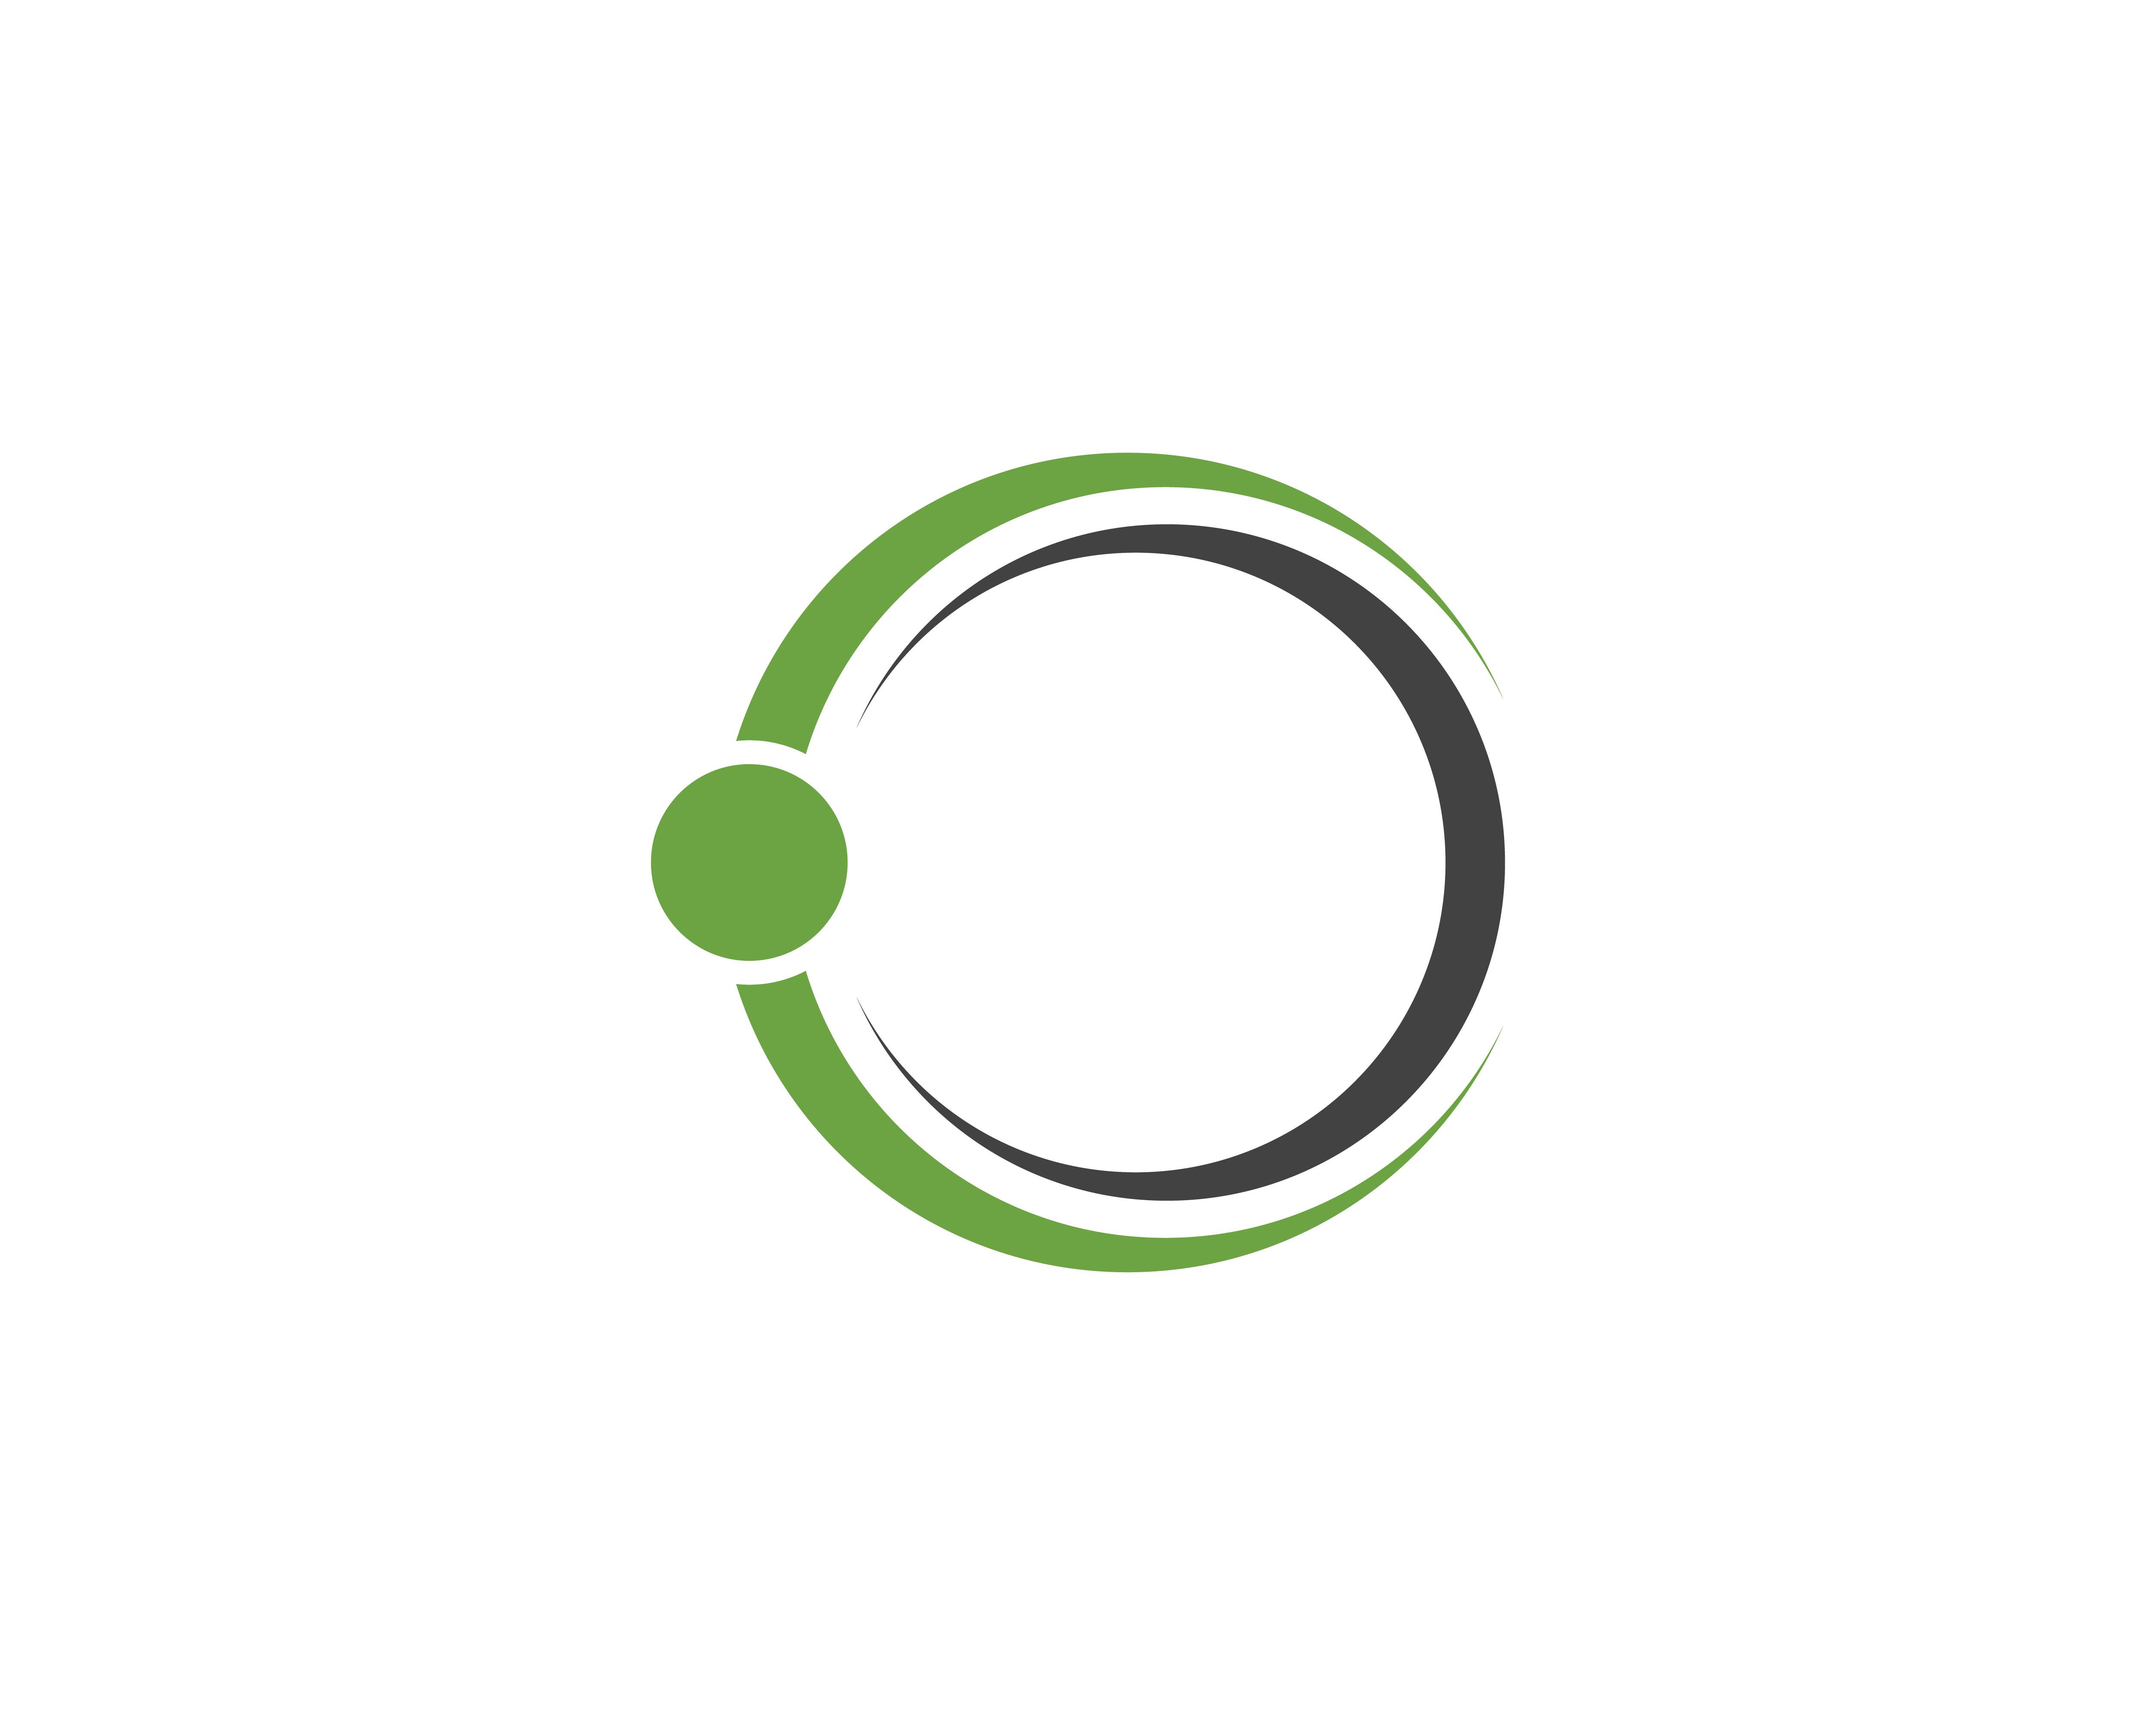 Circle Ring Logo And Symbols Template Icons